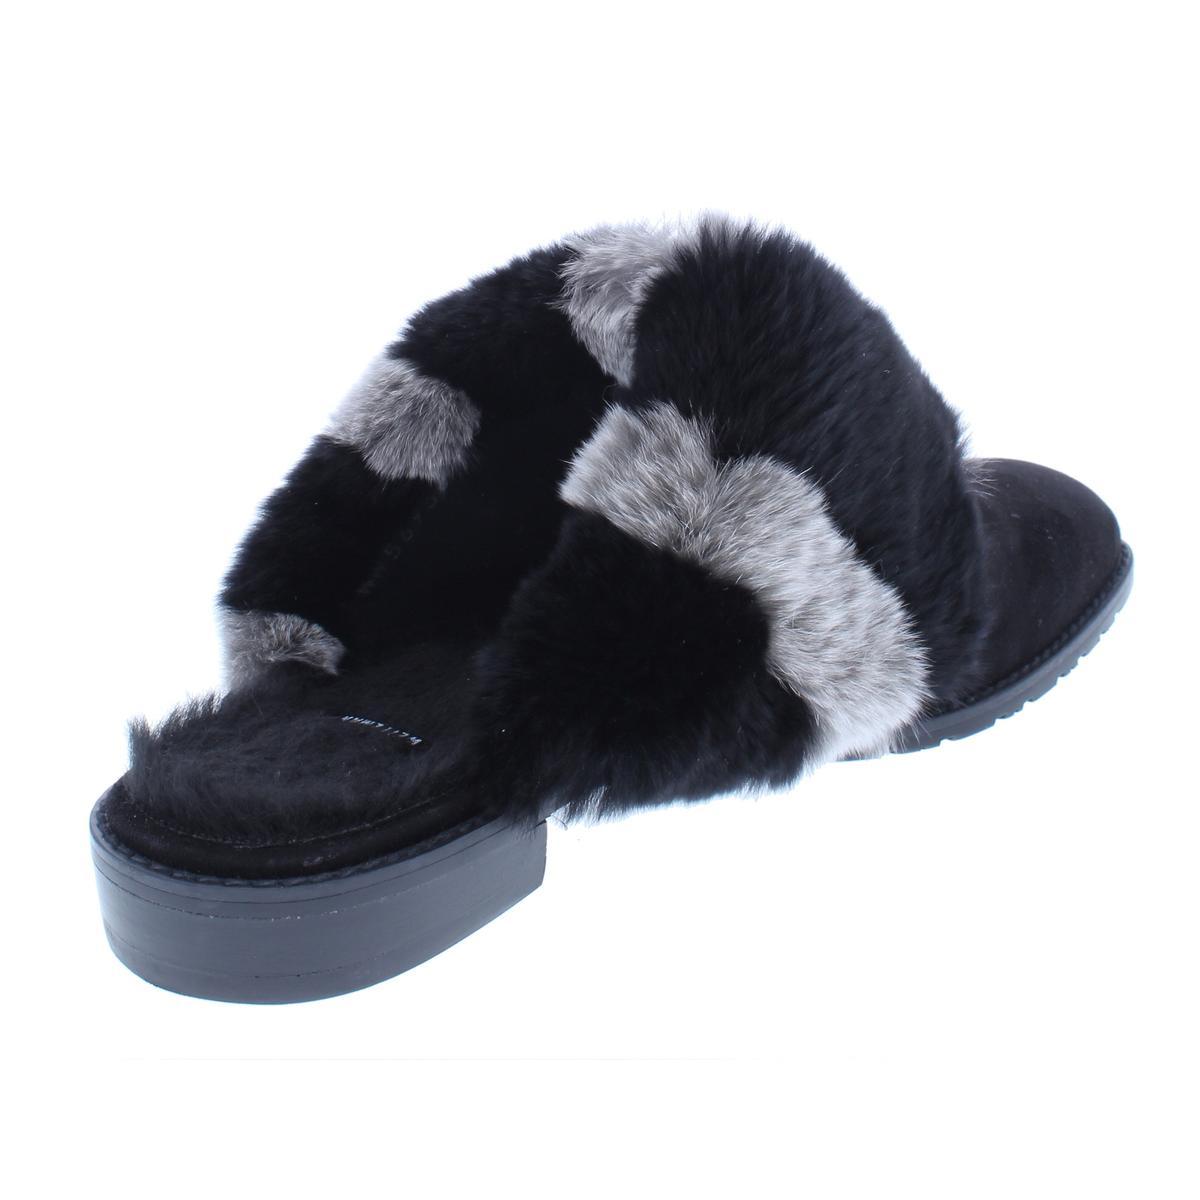 Stuart-Weitzman-Womens-Furgetit-Suede-Fox-Fur-Slide-Mules-Shoes-BHFO-8240 thumbnail 4